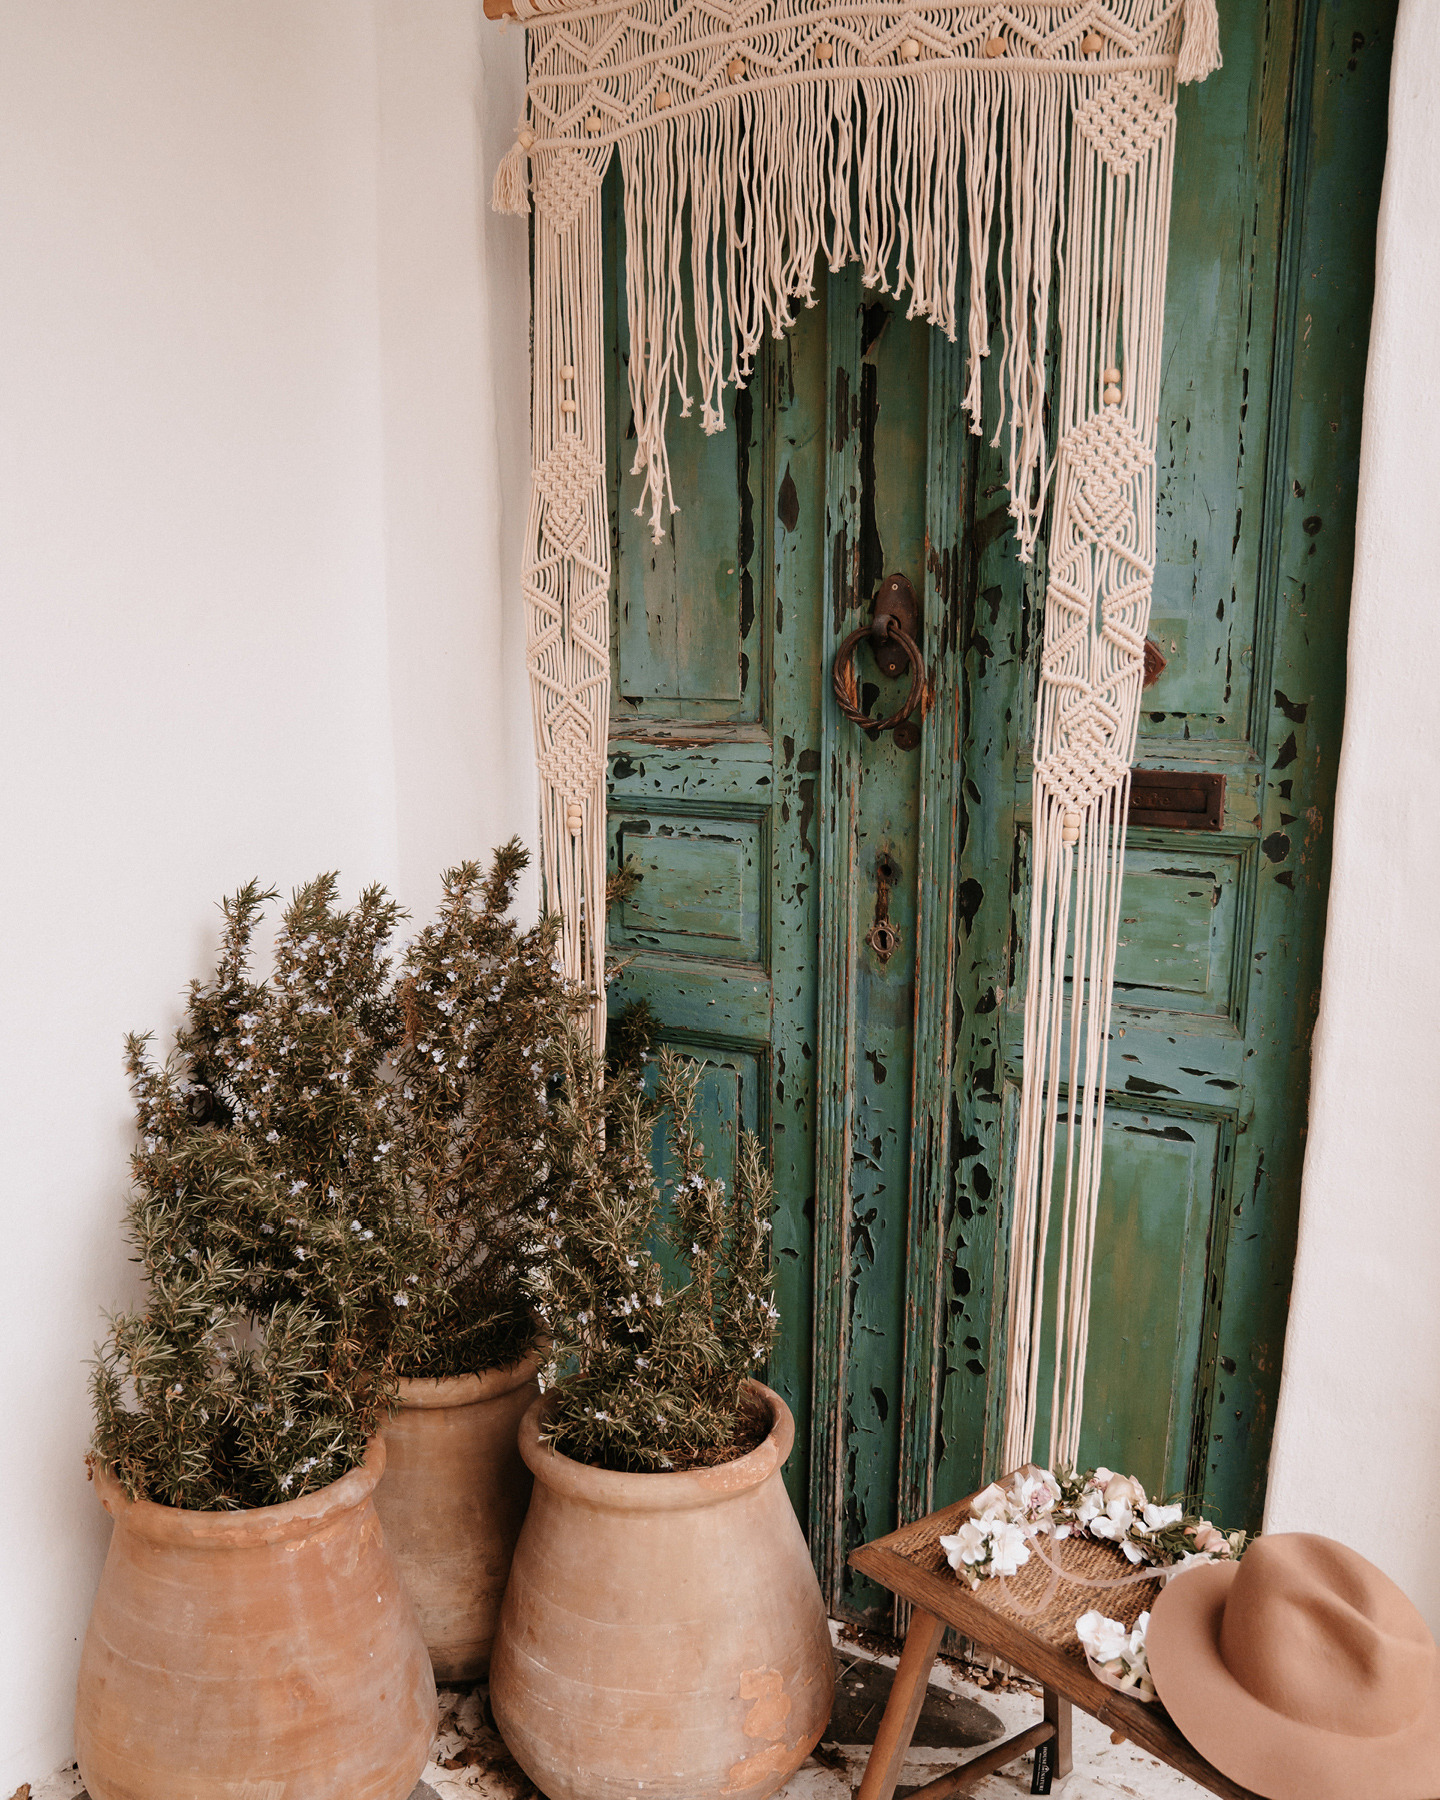 Aufwändig geknotete Makramee Boho Dekoration hängt an grüner Tür.